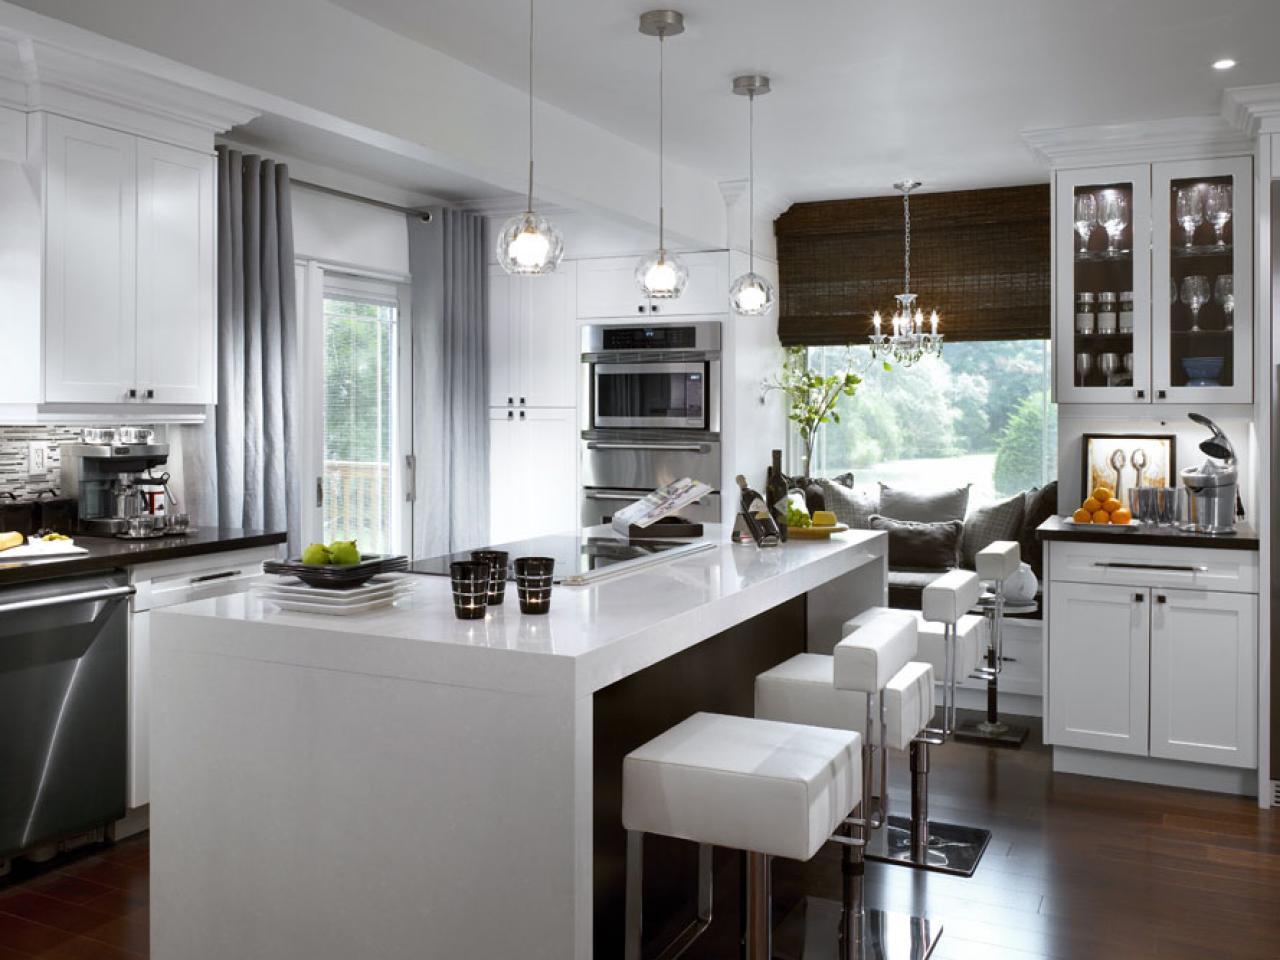 candice olson kitchen cabinets photo - 6